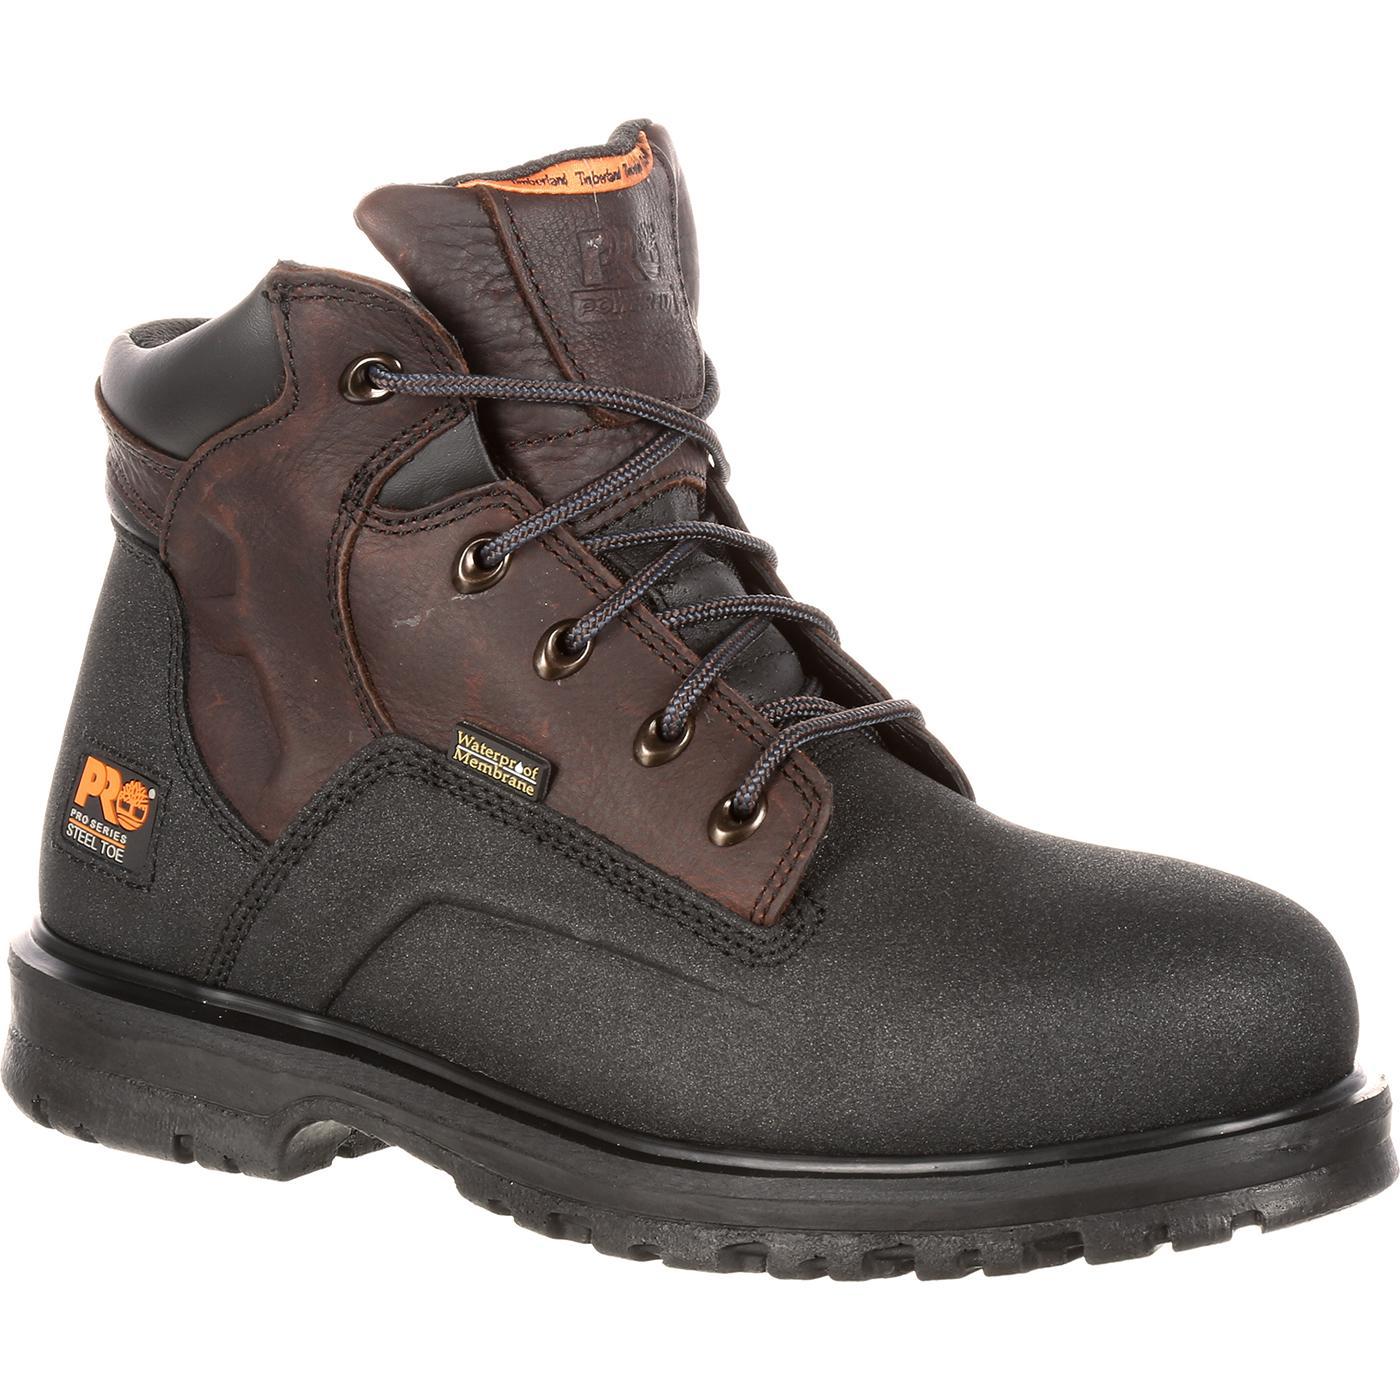 Timberland Pro Steel Toe Waterproof Work Boots 47001